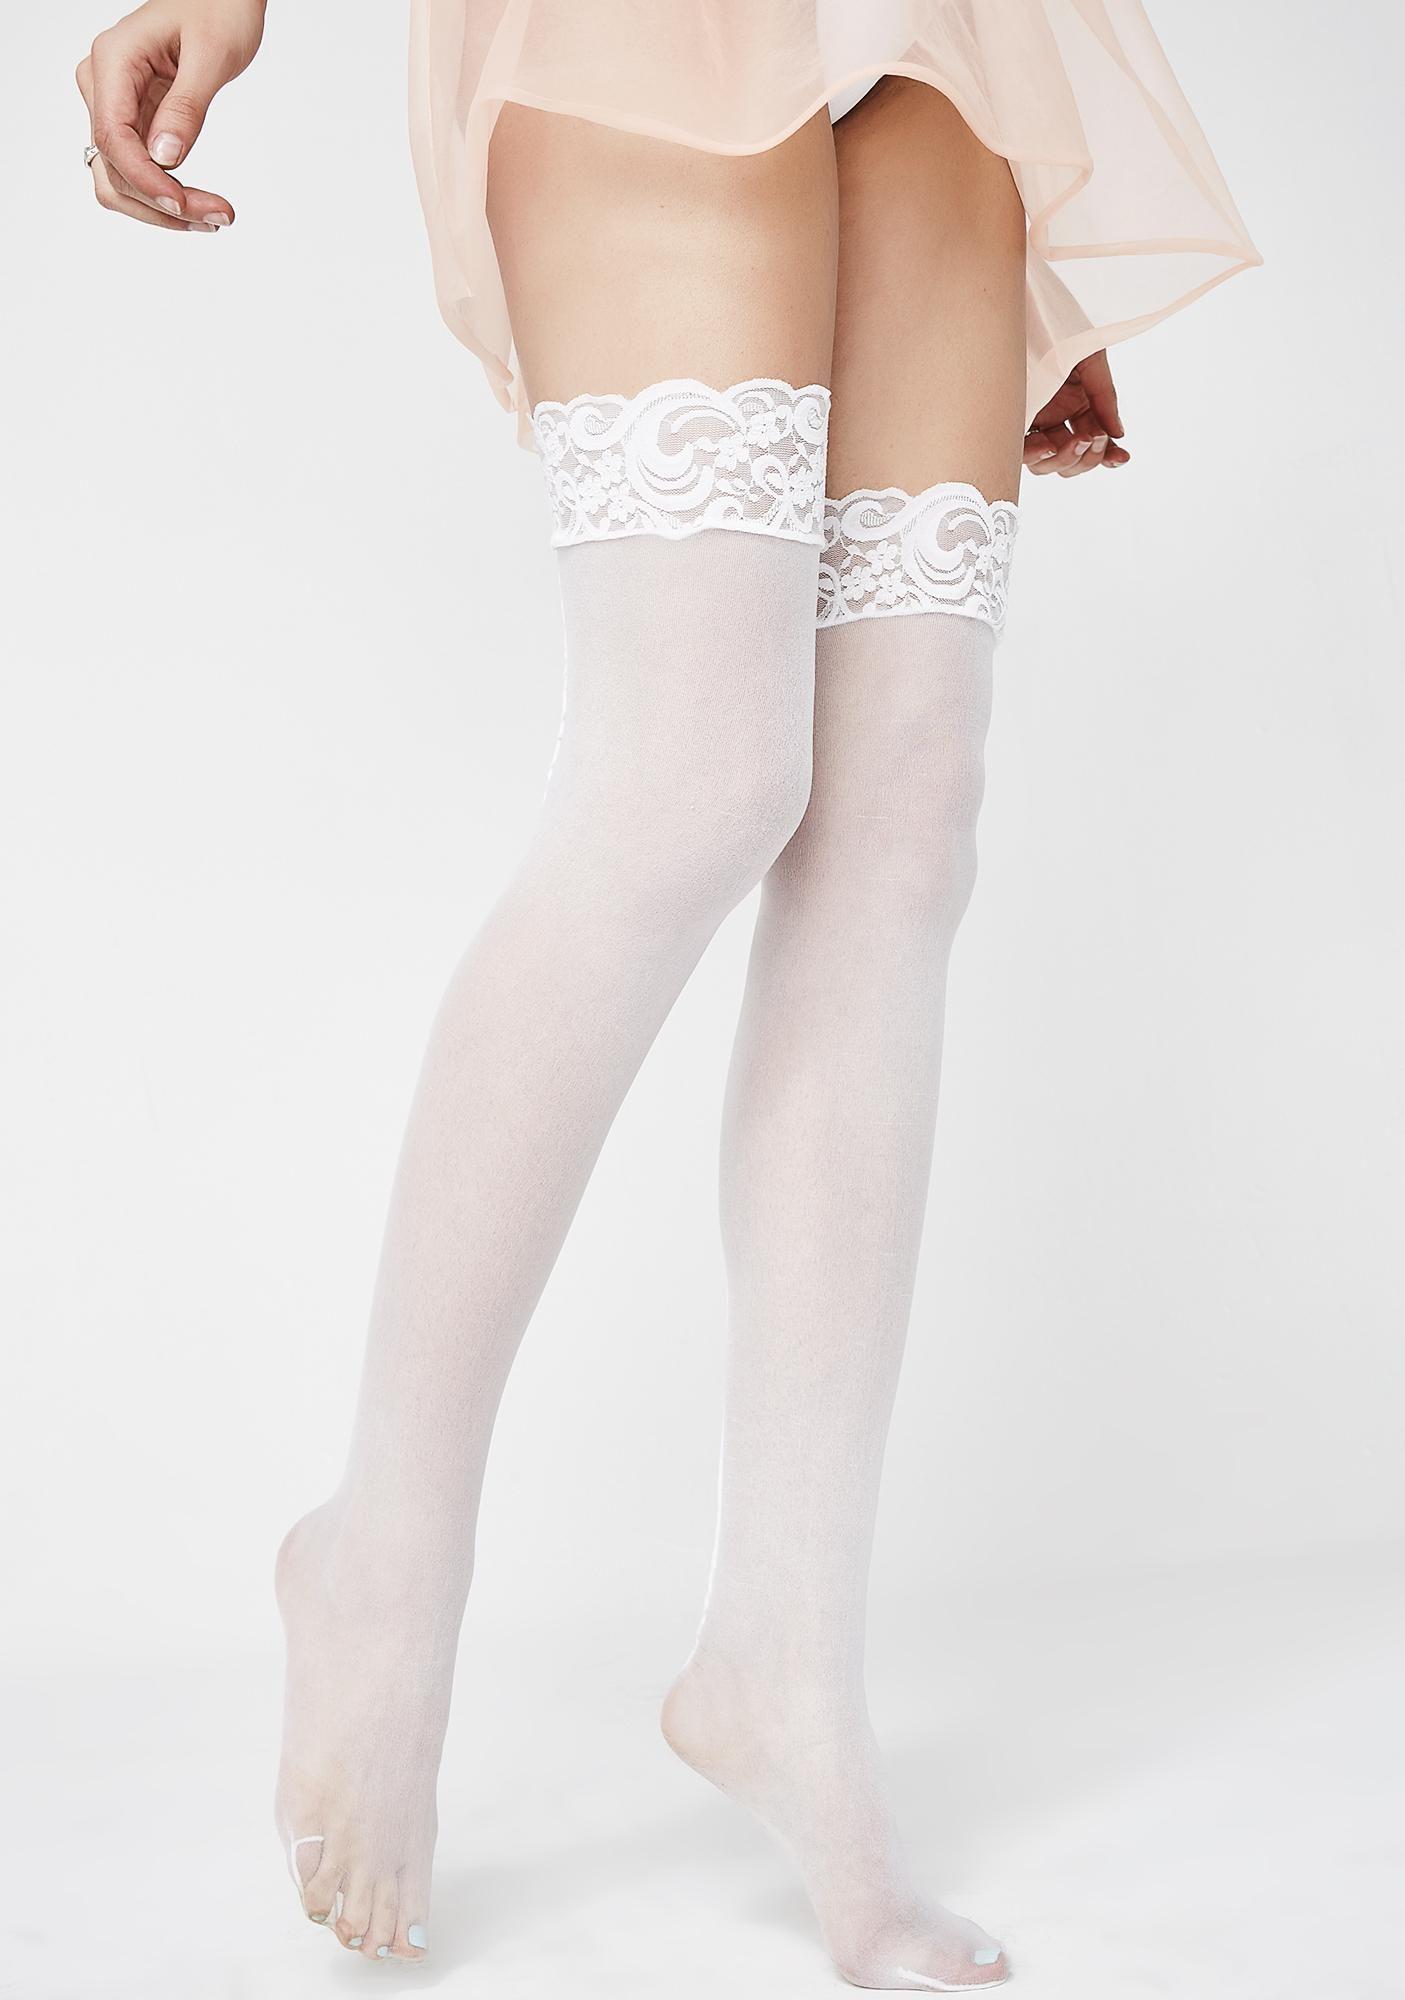 Women Thigh Stockings High Socks Pantyhose Tights Lace Cotton Over Knee Kawaii